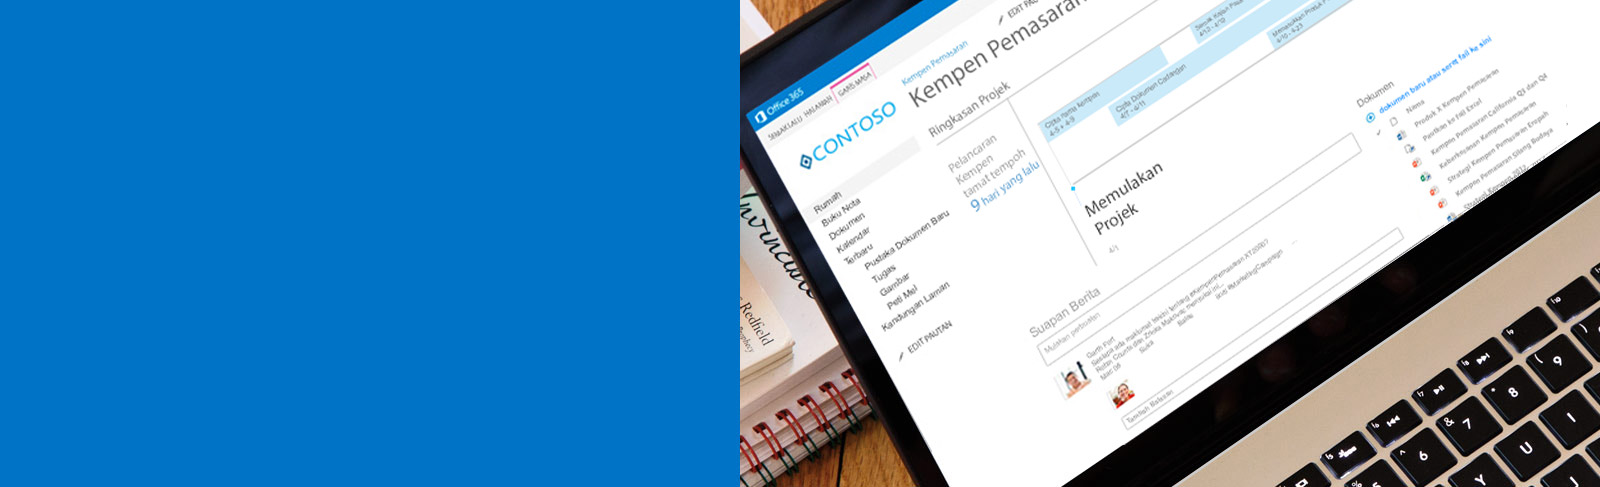 Komputer riba menunjukkan dokumen sedang dicapai pada SharePoint.